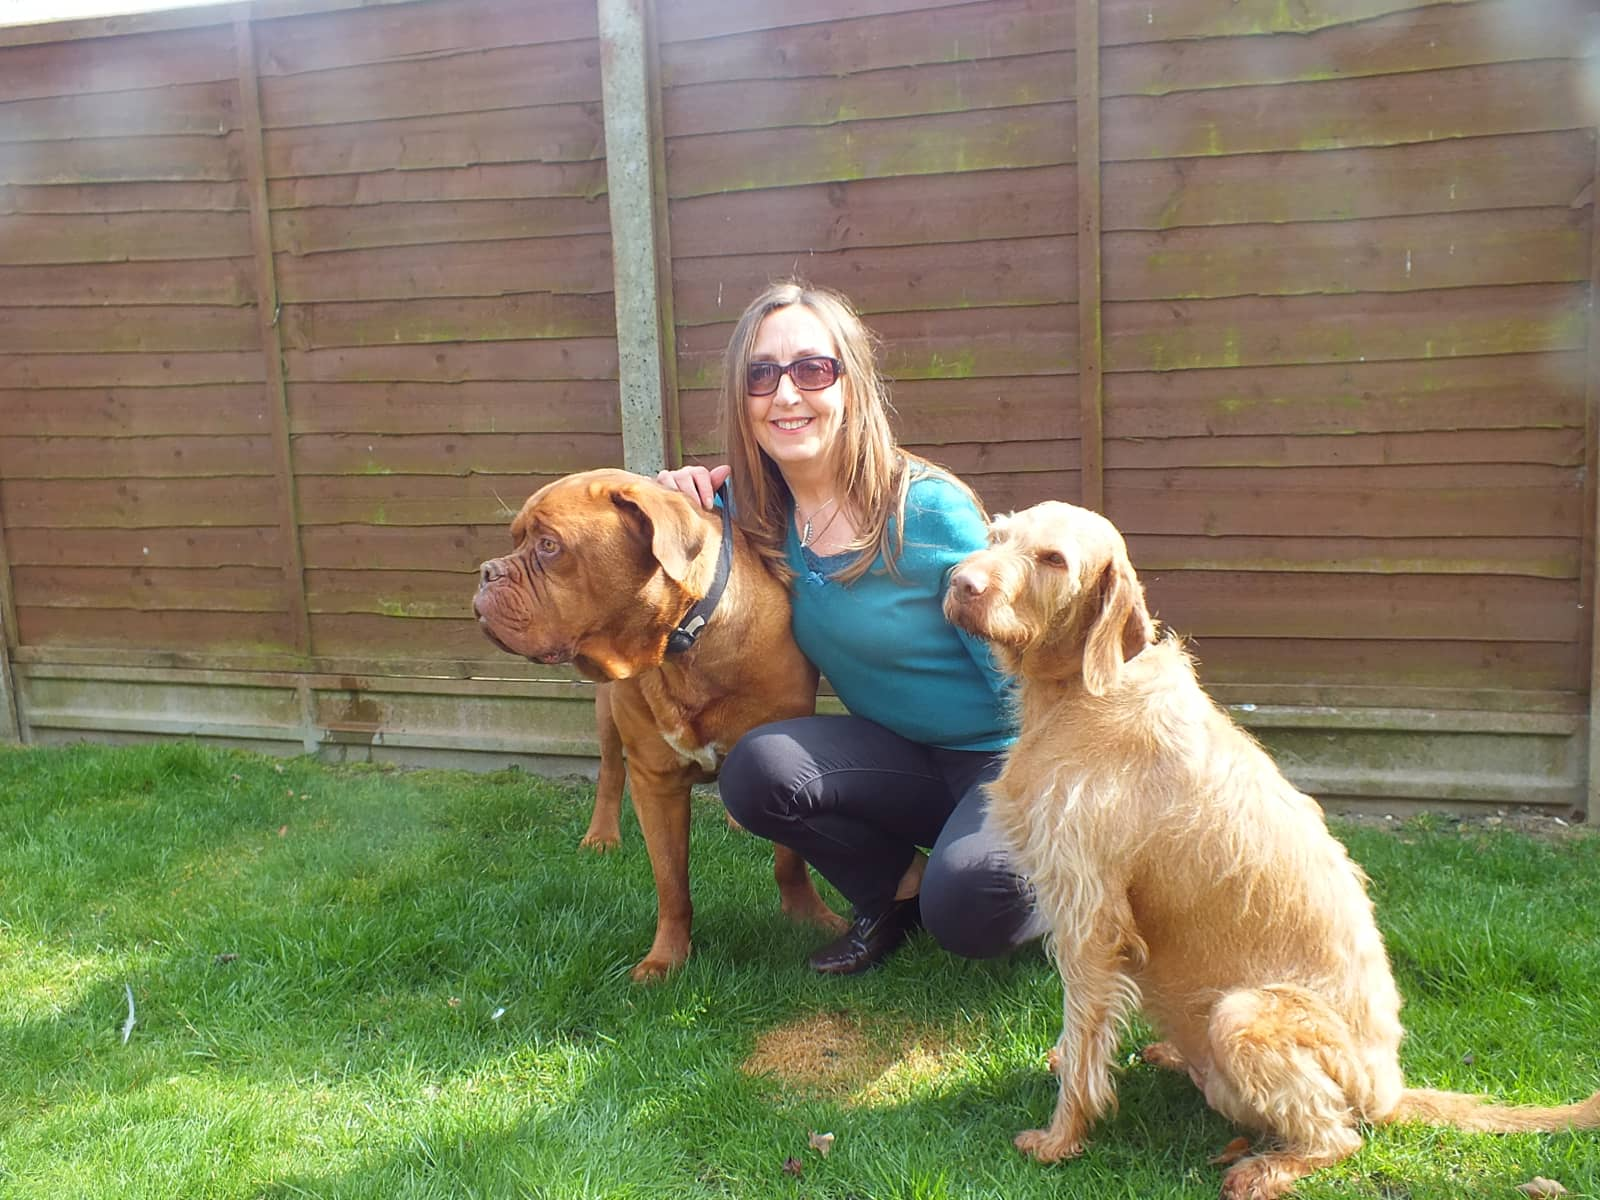 Carole from Luton, United Kingdom